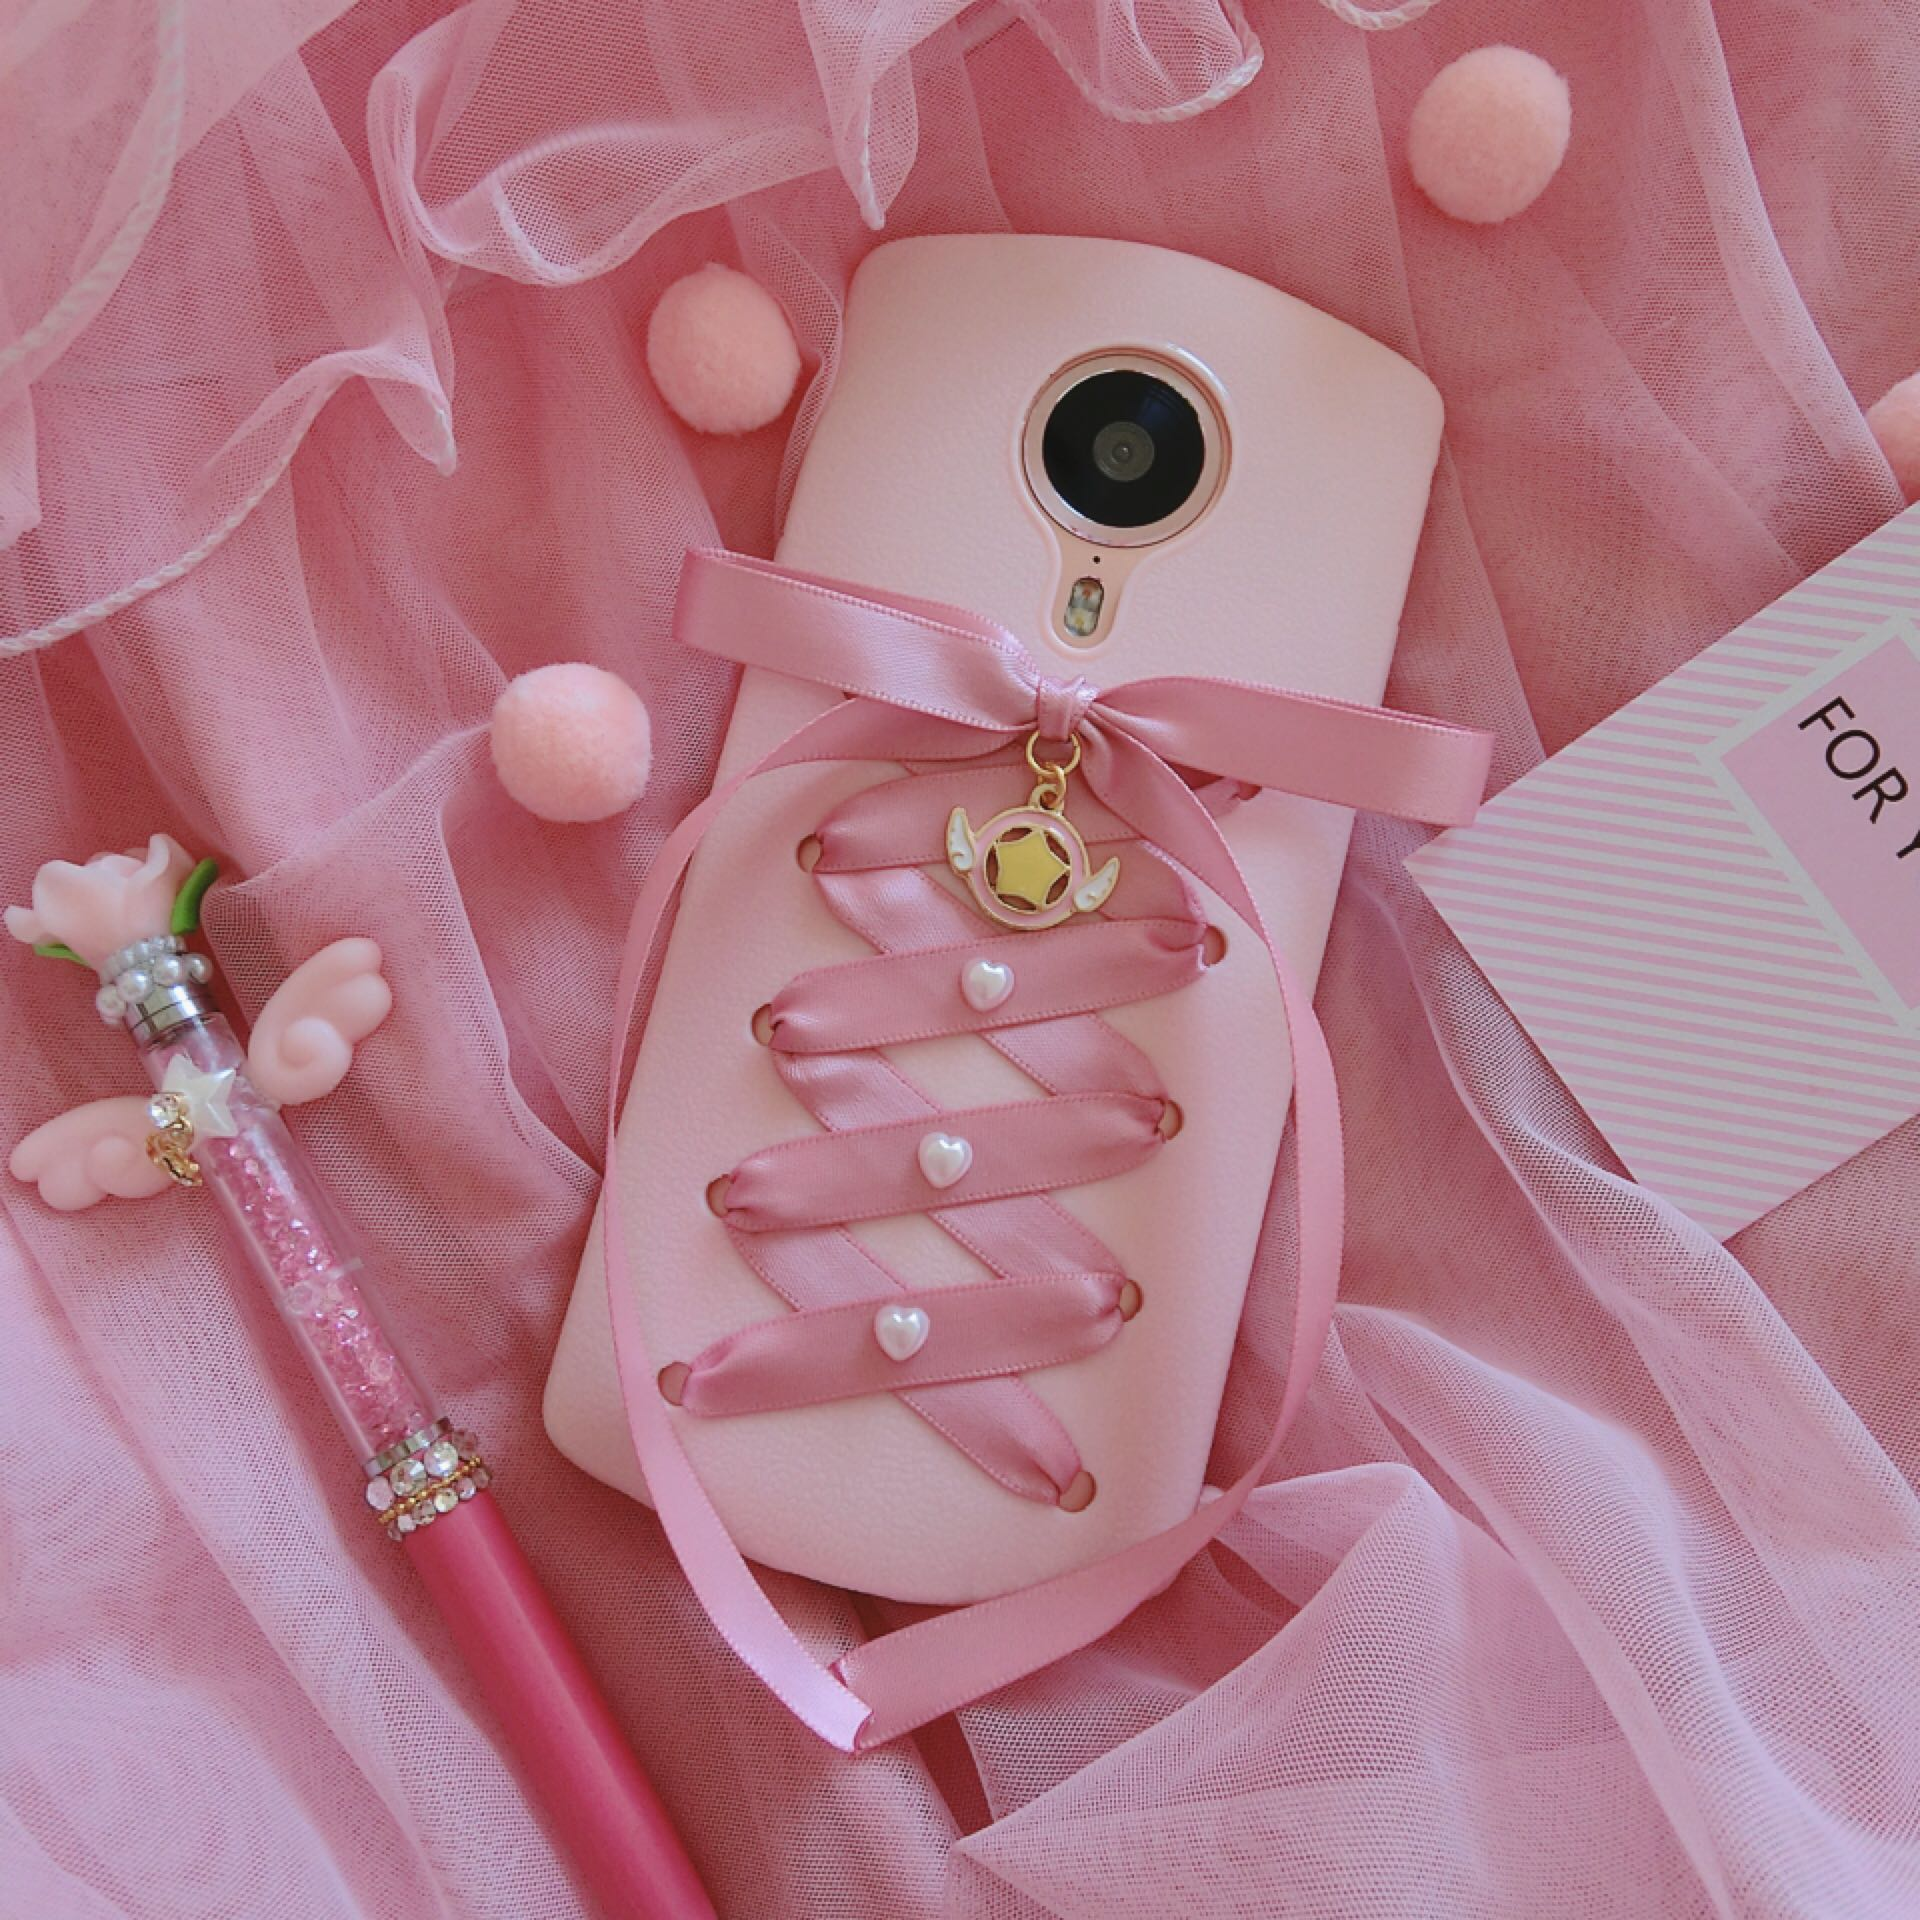 Mito M8/T8/M6S/M4 Sakura morphers ribbon girl heart all silicone mobile phone shell